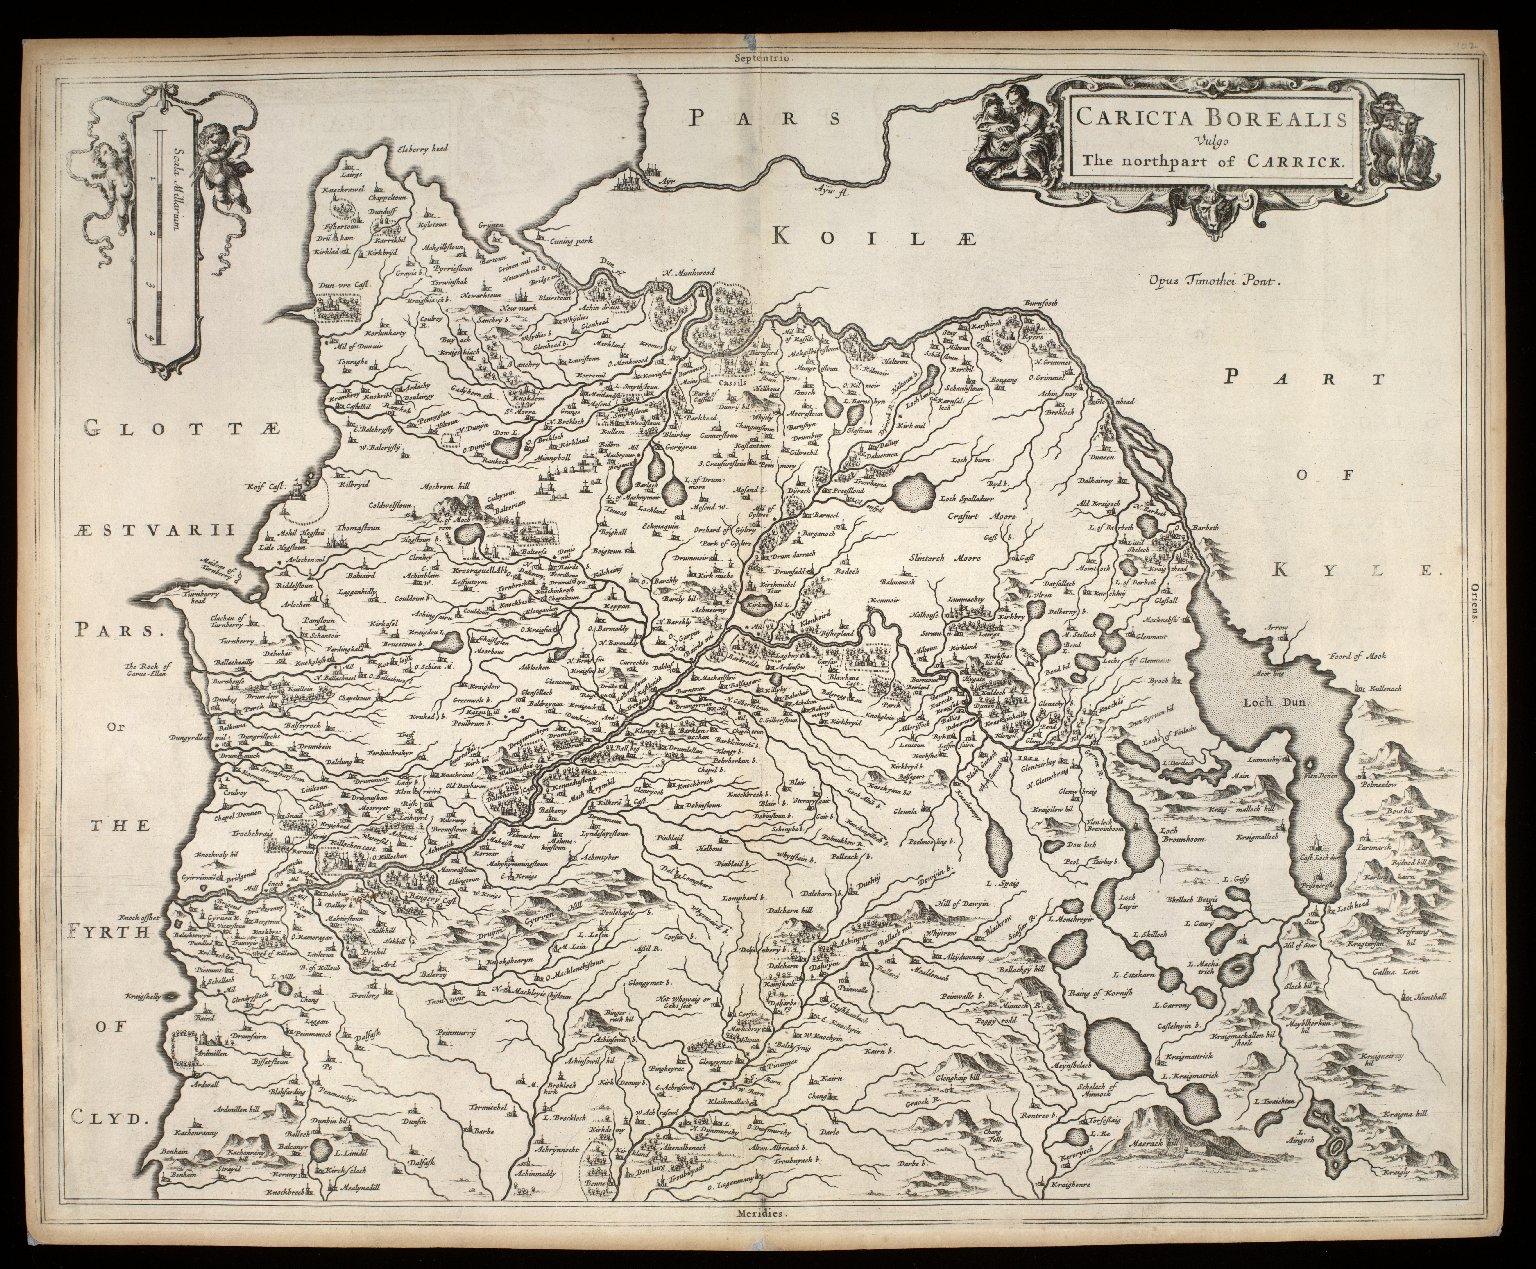 Caricta Borealis, vulgo the northpart of Carrick [1 of 1]